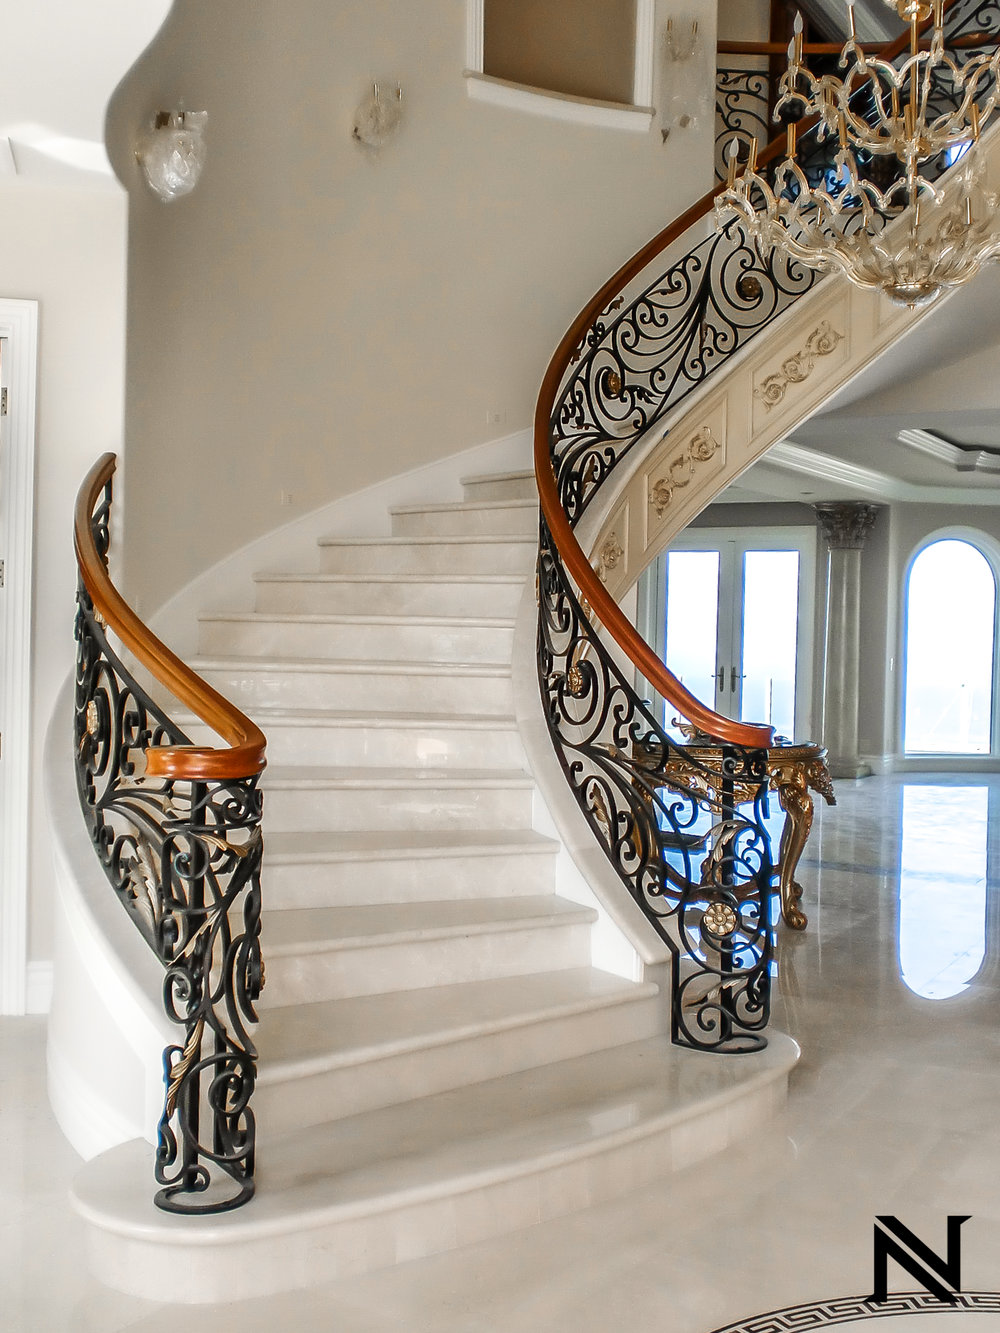 Custom, Hand Forged Ornate Designed Stair Railing in Orange County, California